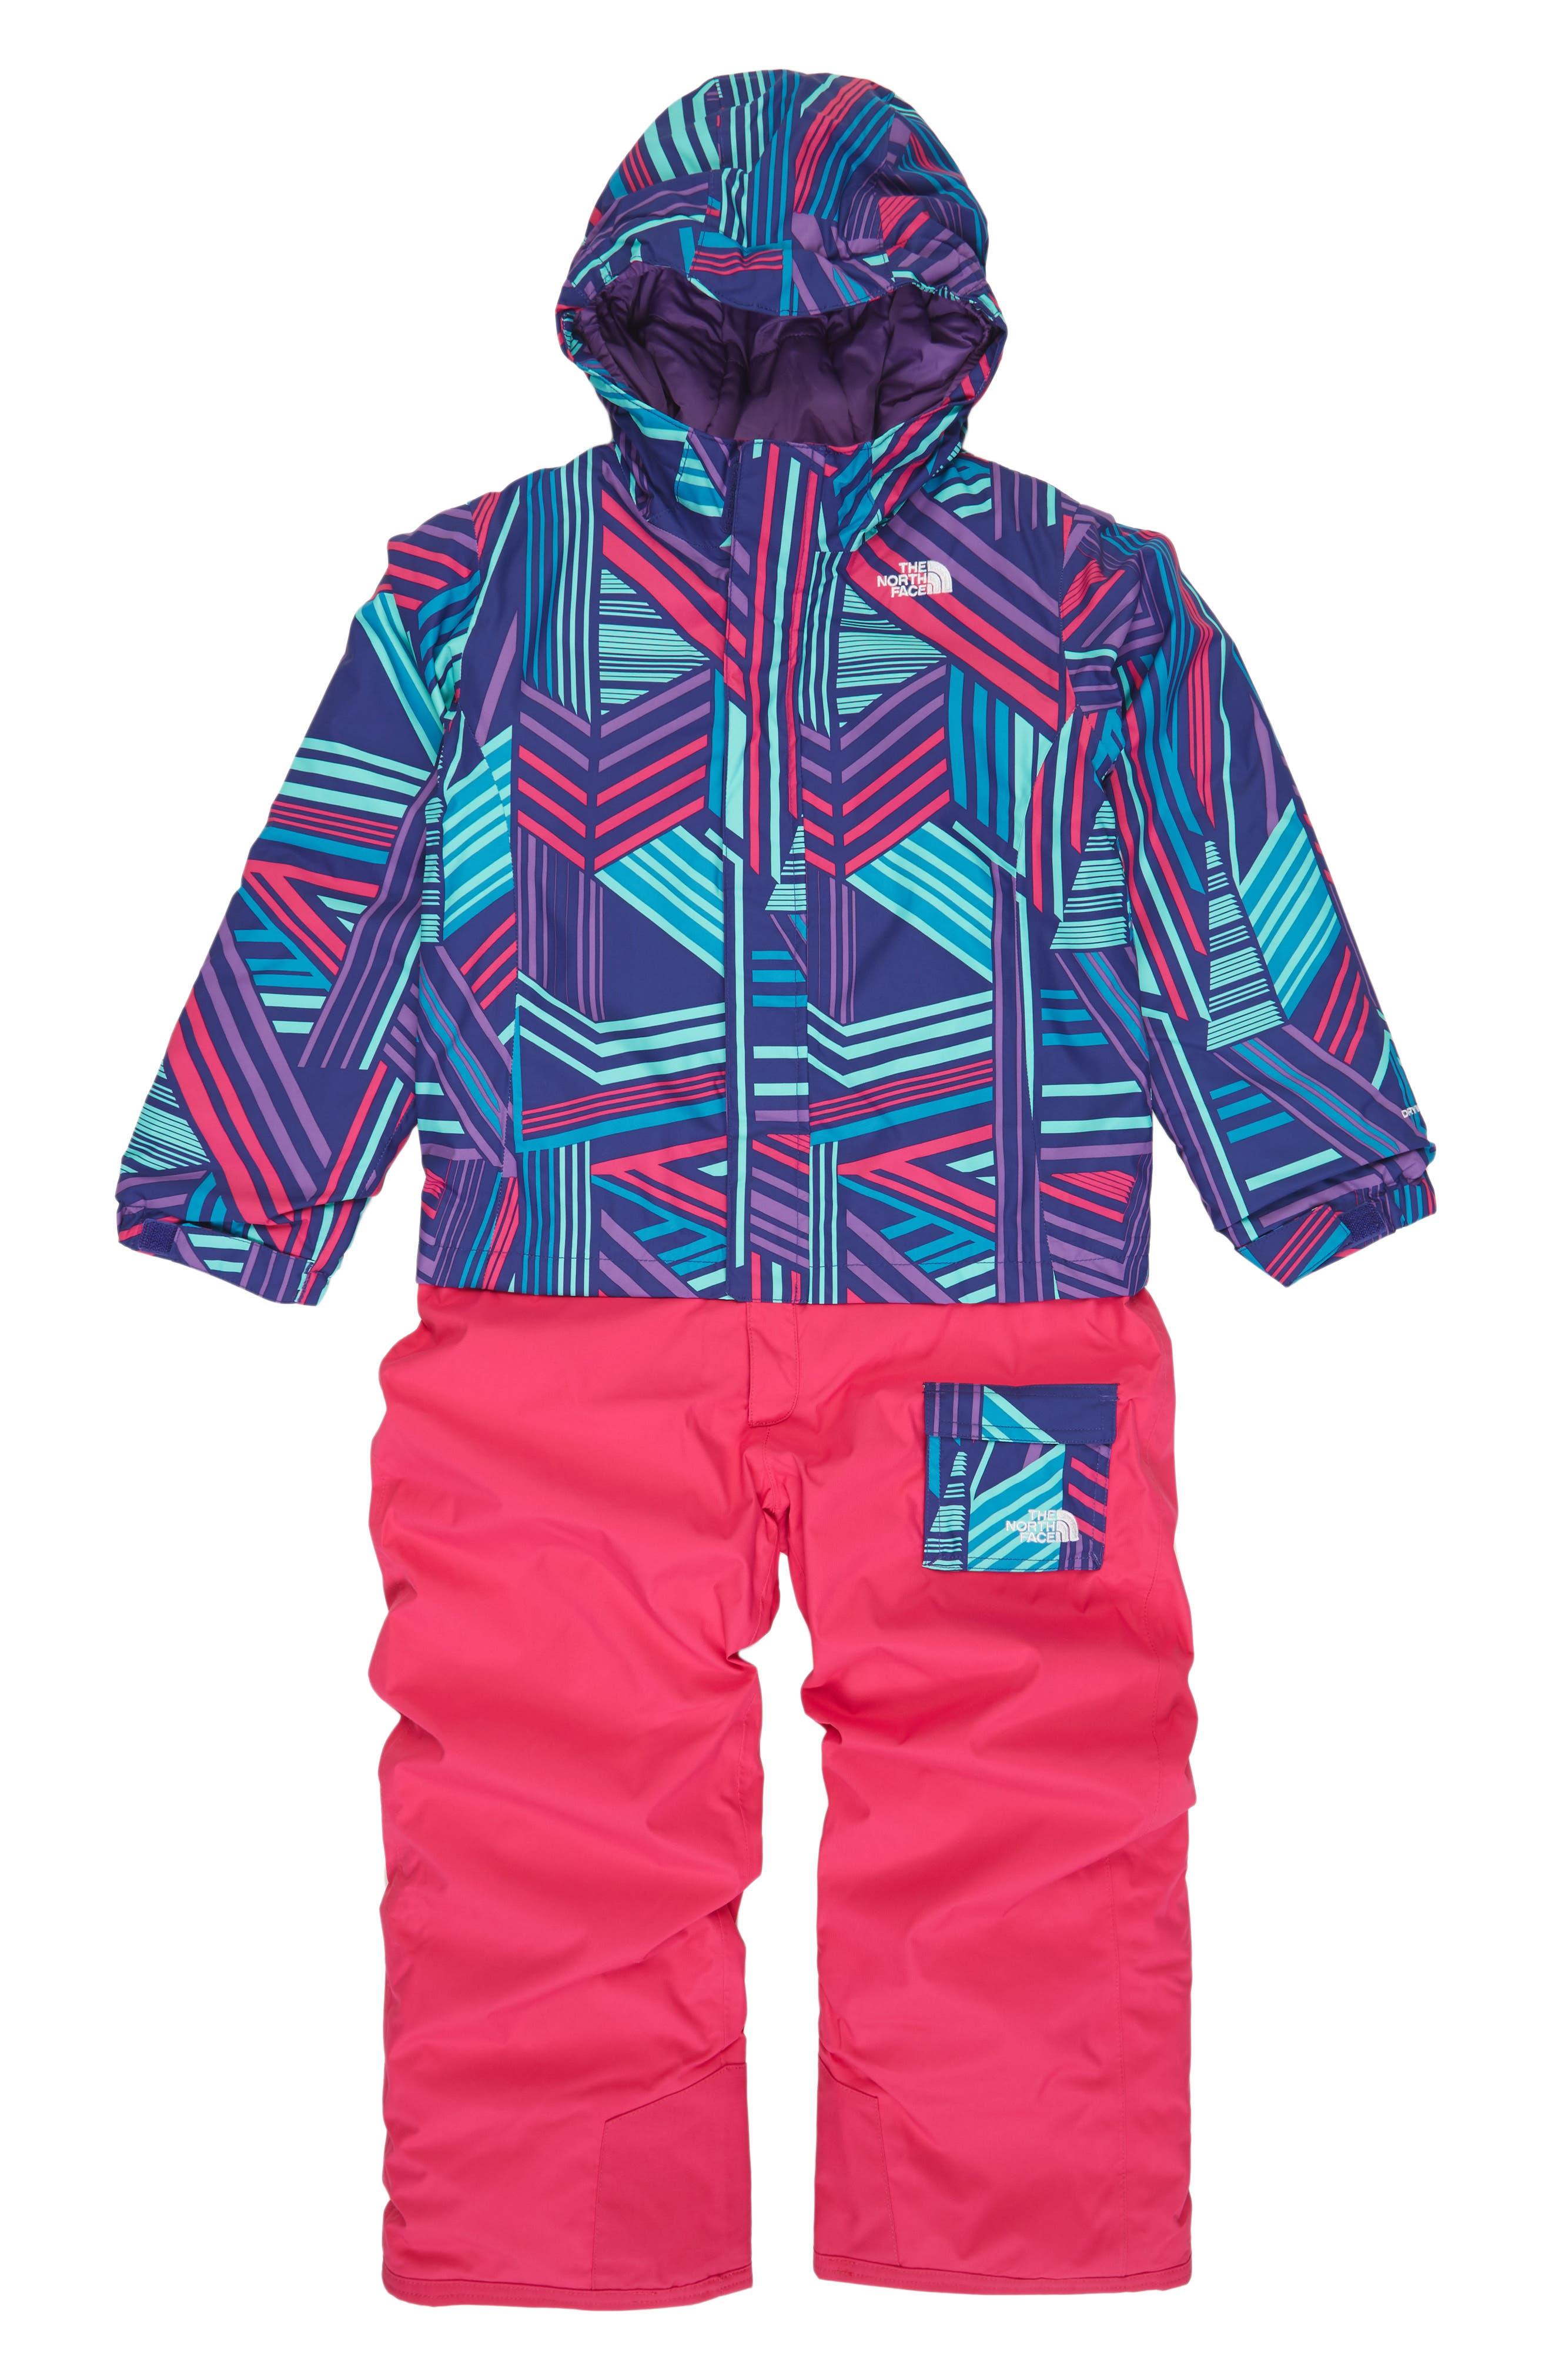 Alternate Image 1 Selected - The North Face Heatseeker™ Insulated Waterproof Snowsuit (Toddler Girls)